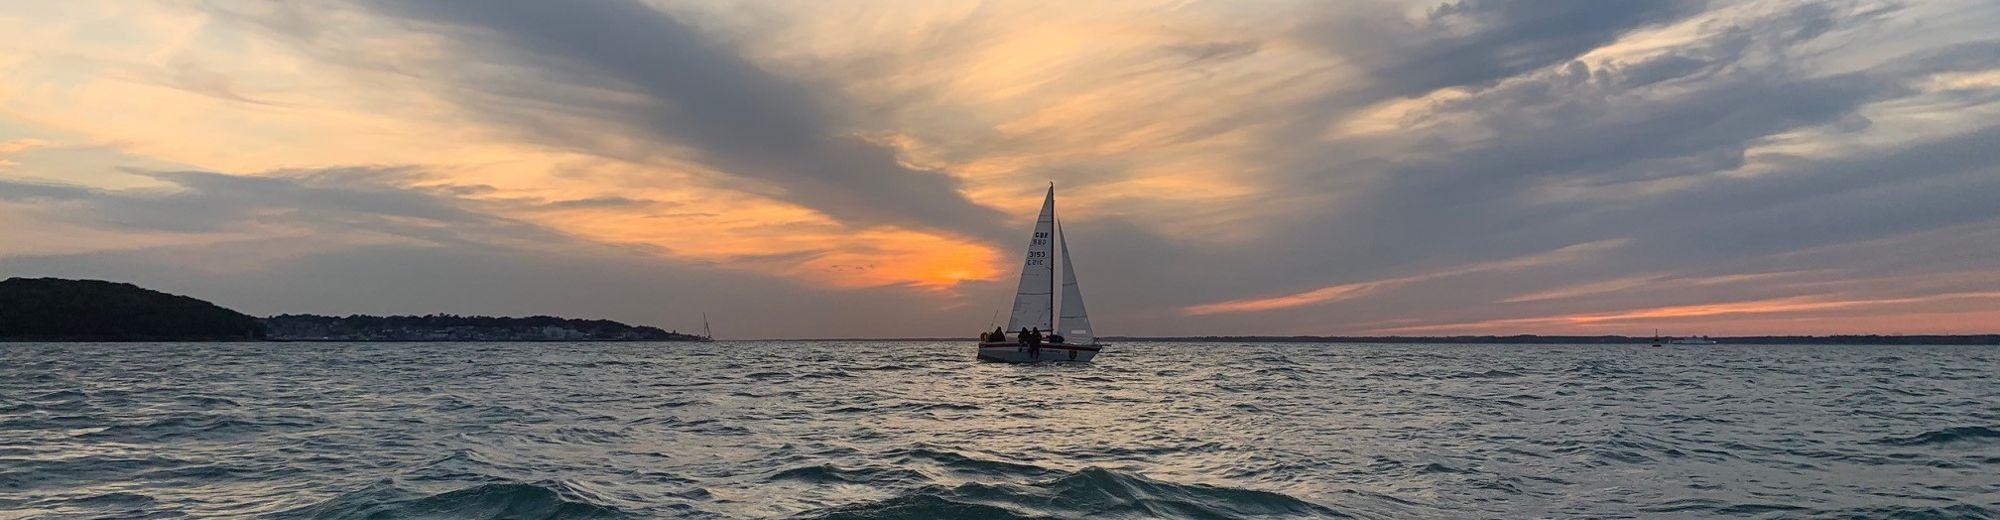 Sailing Sept 20